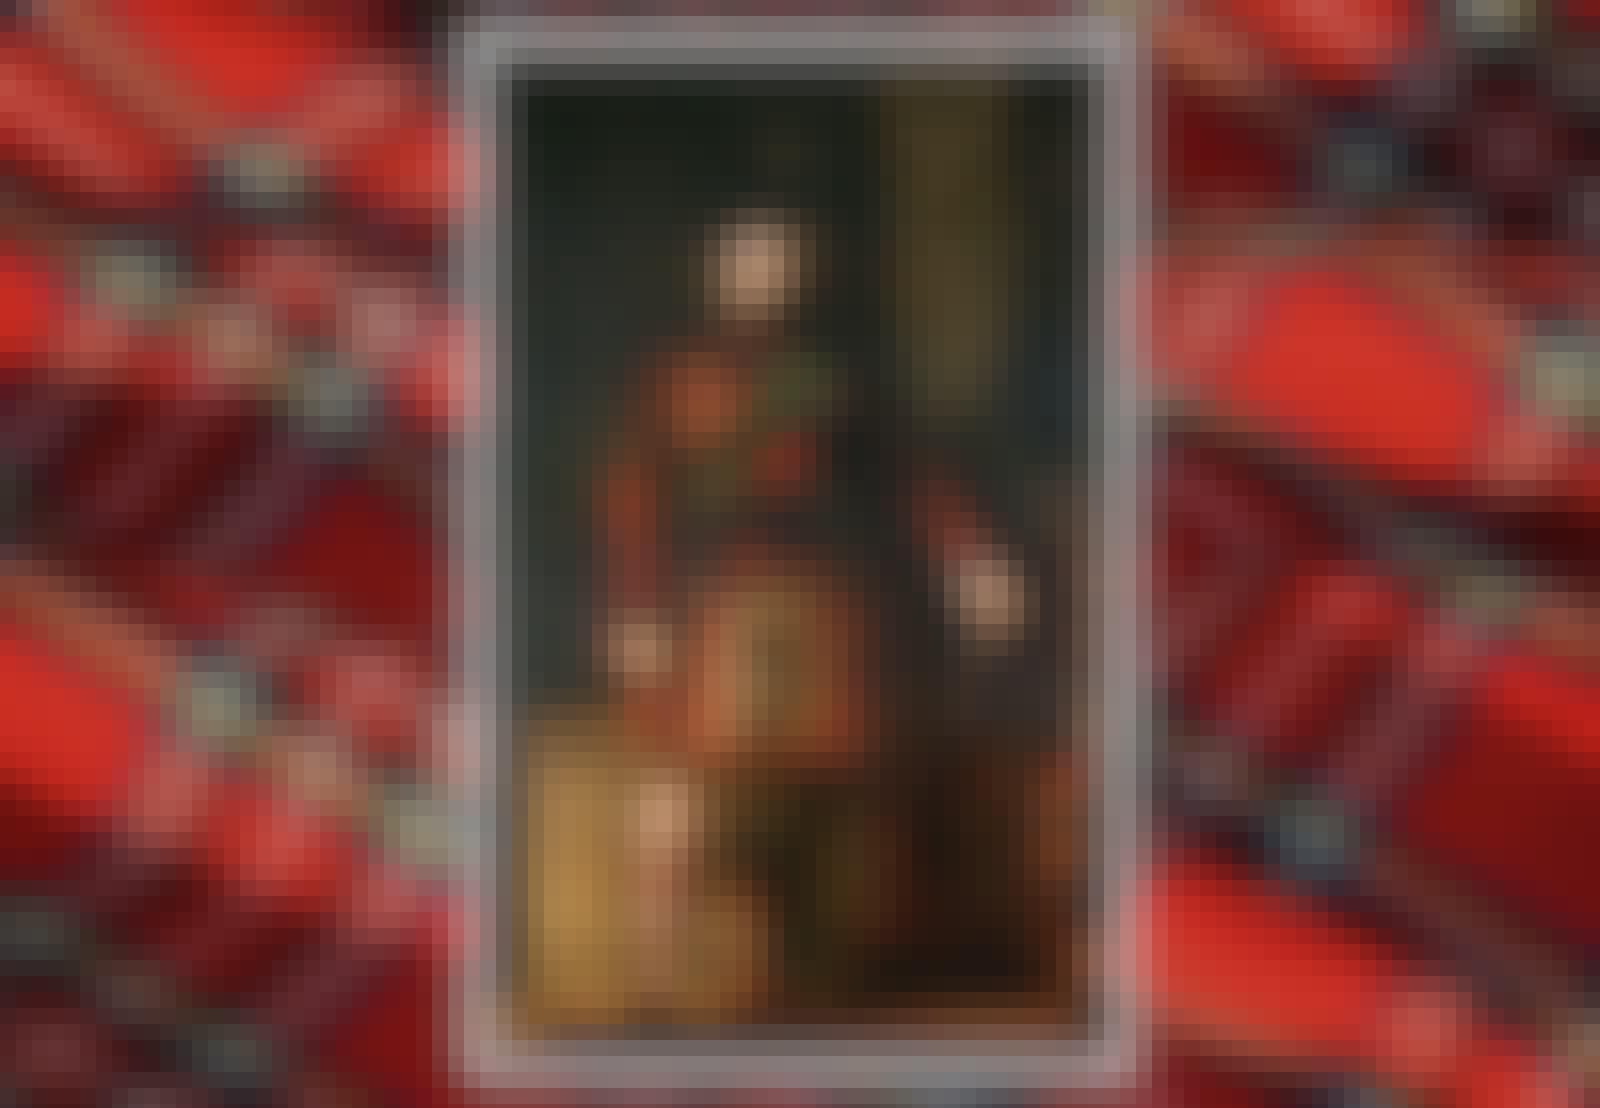 Georg 4 portræt